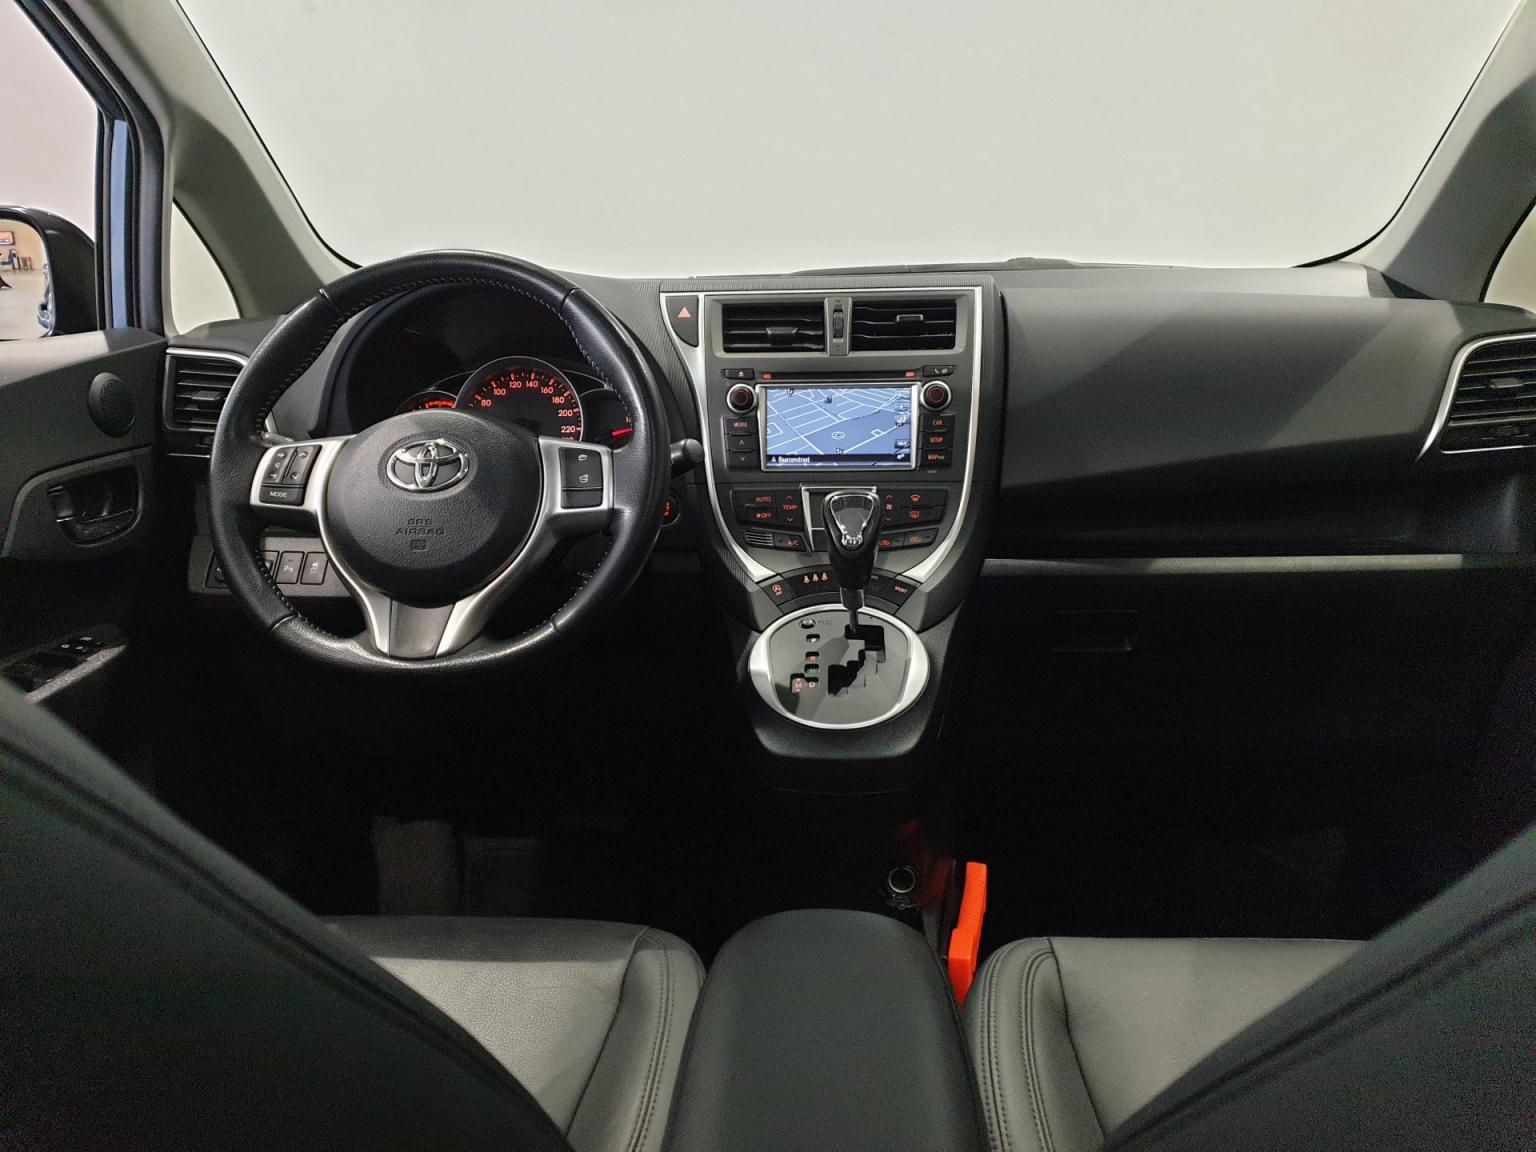 Toyota-Verso-S-31